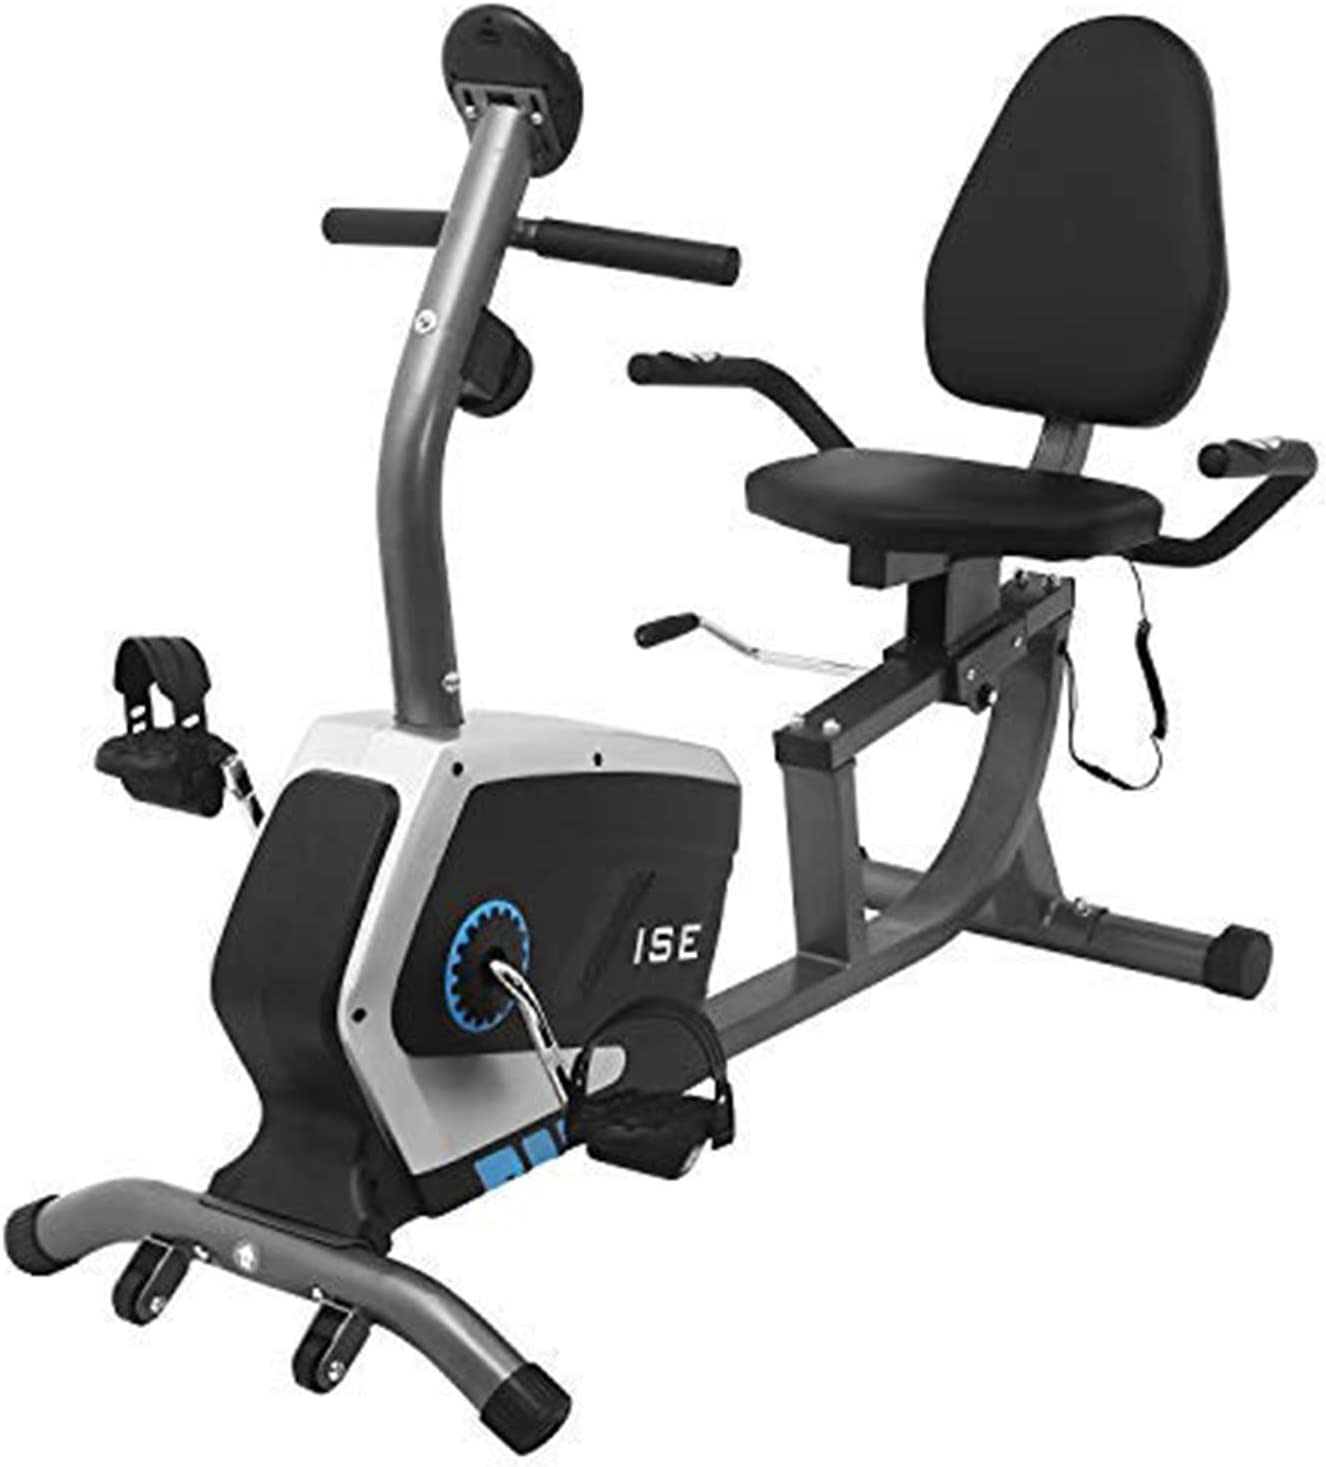 ISE Bicicleta estática magnética horizontal con 8 niveles de resistencia y sillín ajustable, bicicleta de fitness con respaldo, sensores de pulsación integrados, máx. 120 kg, súper silencioso, SY-6801